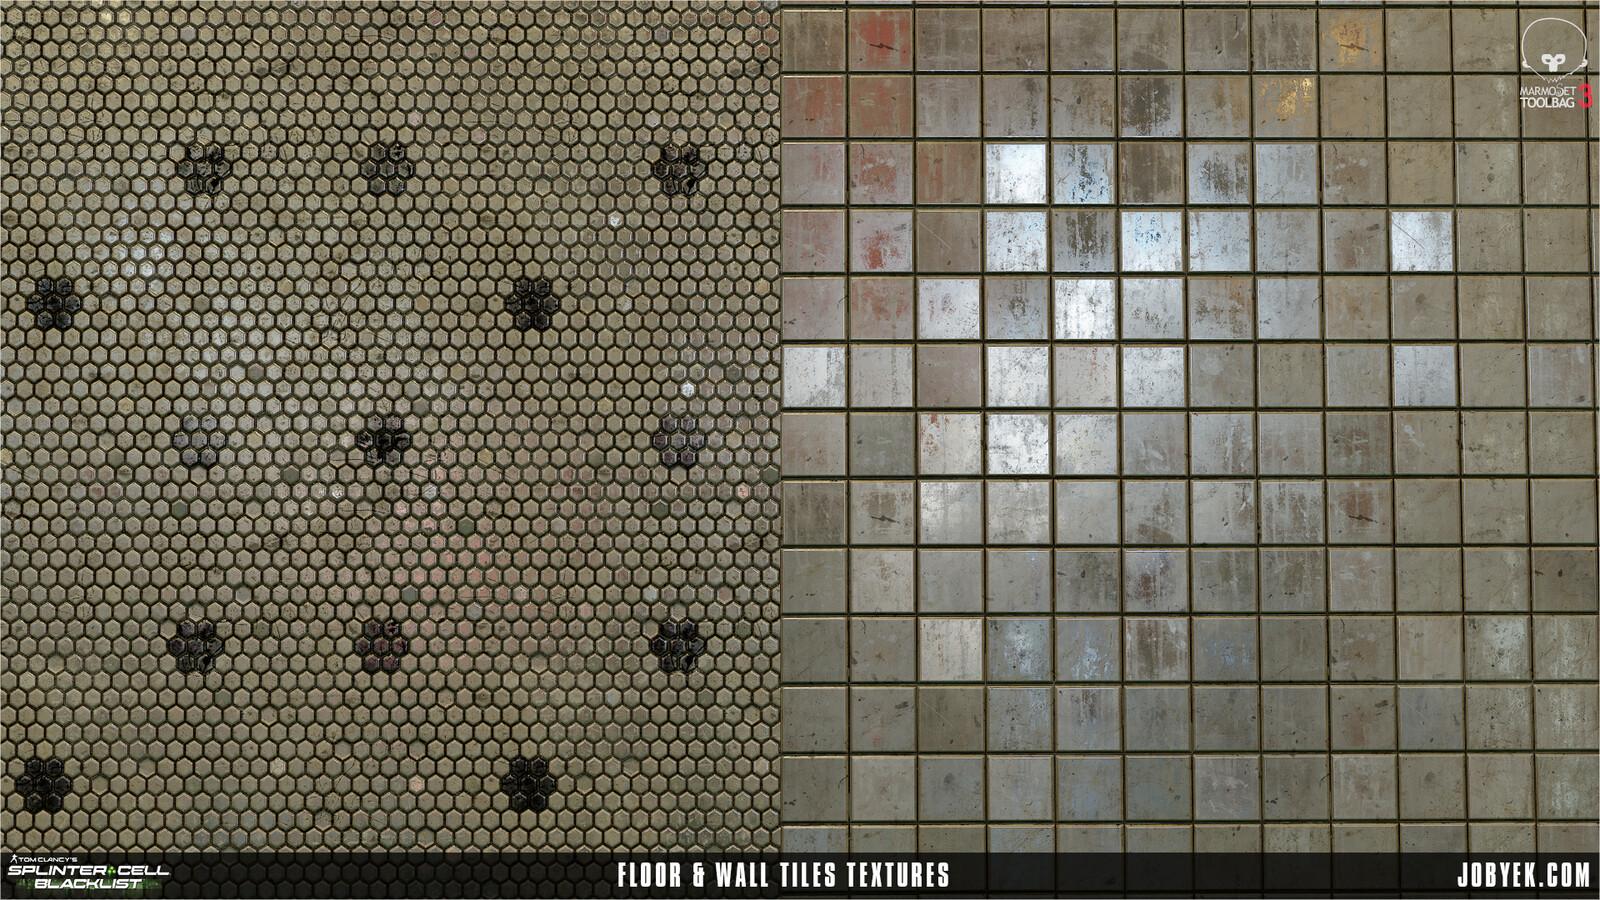 Apartment Tiles textures